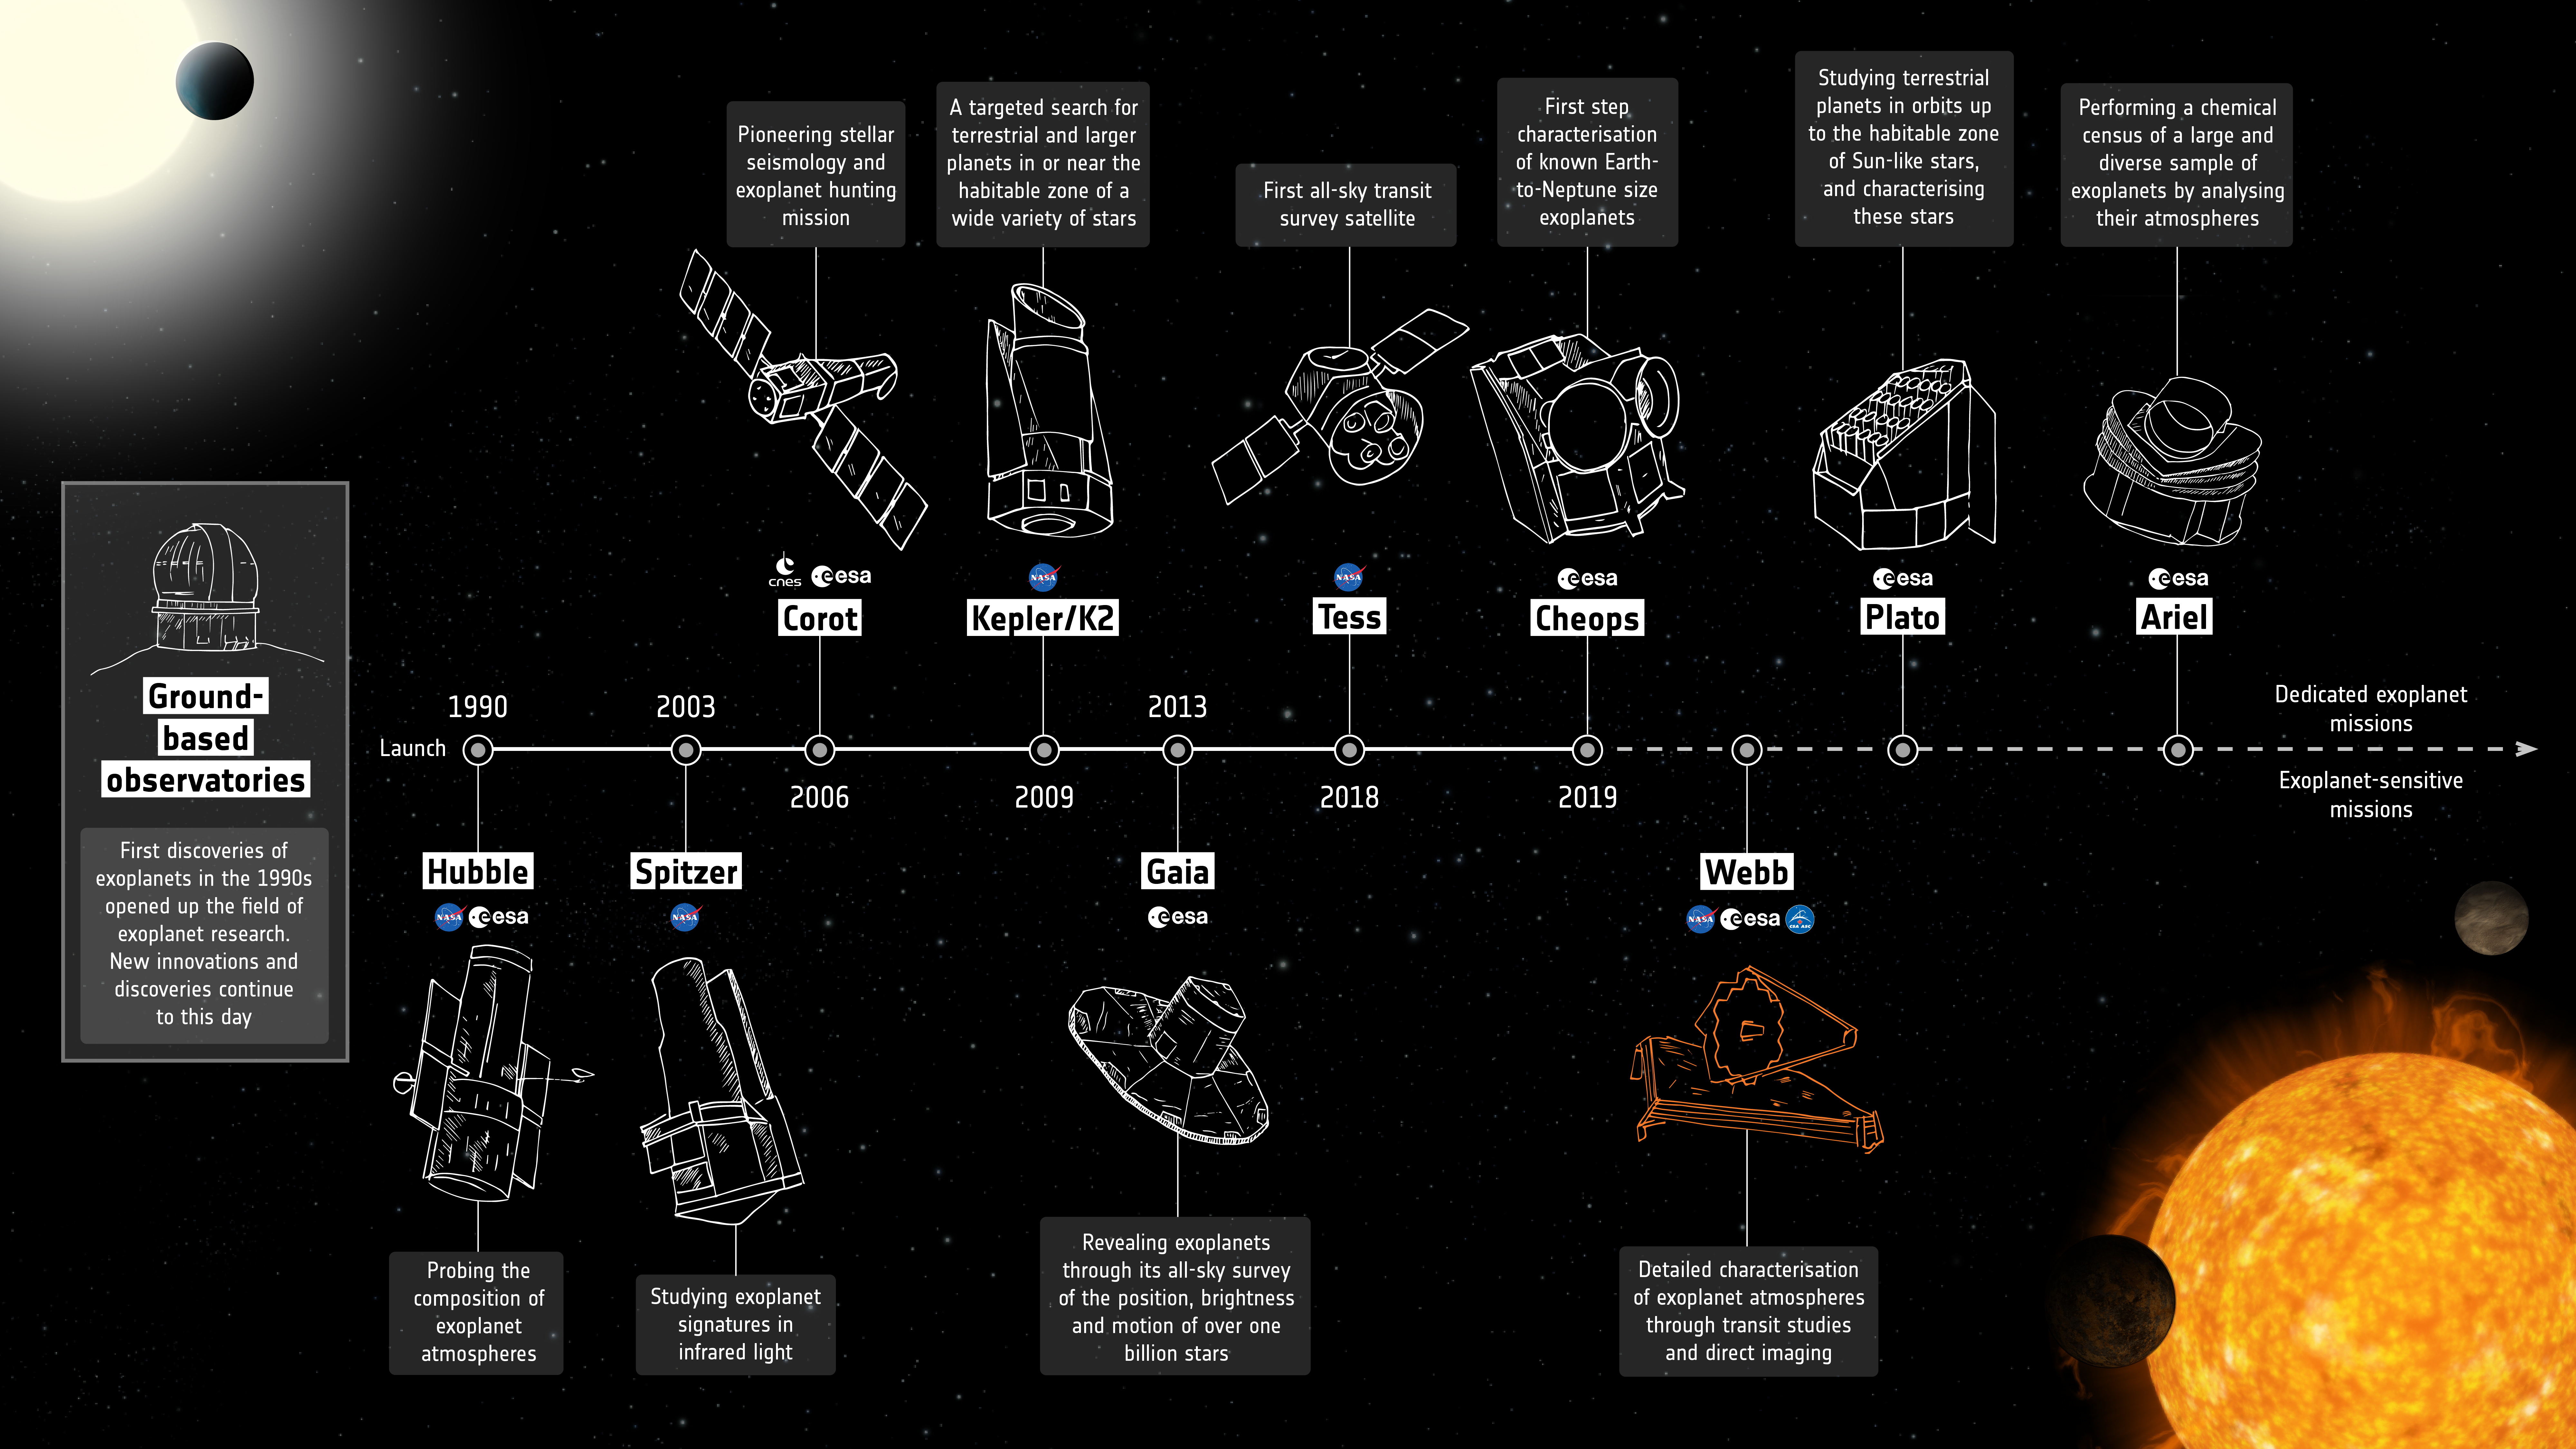 Exoplanets_missions_20201127_webb.jpg